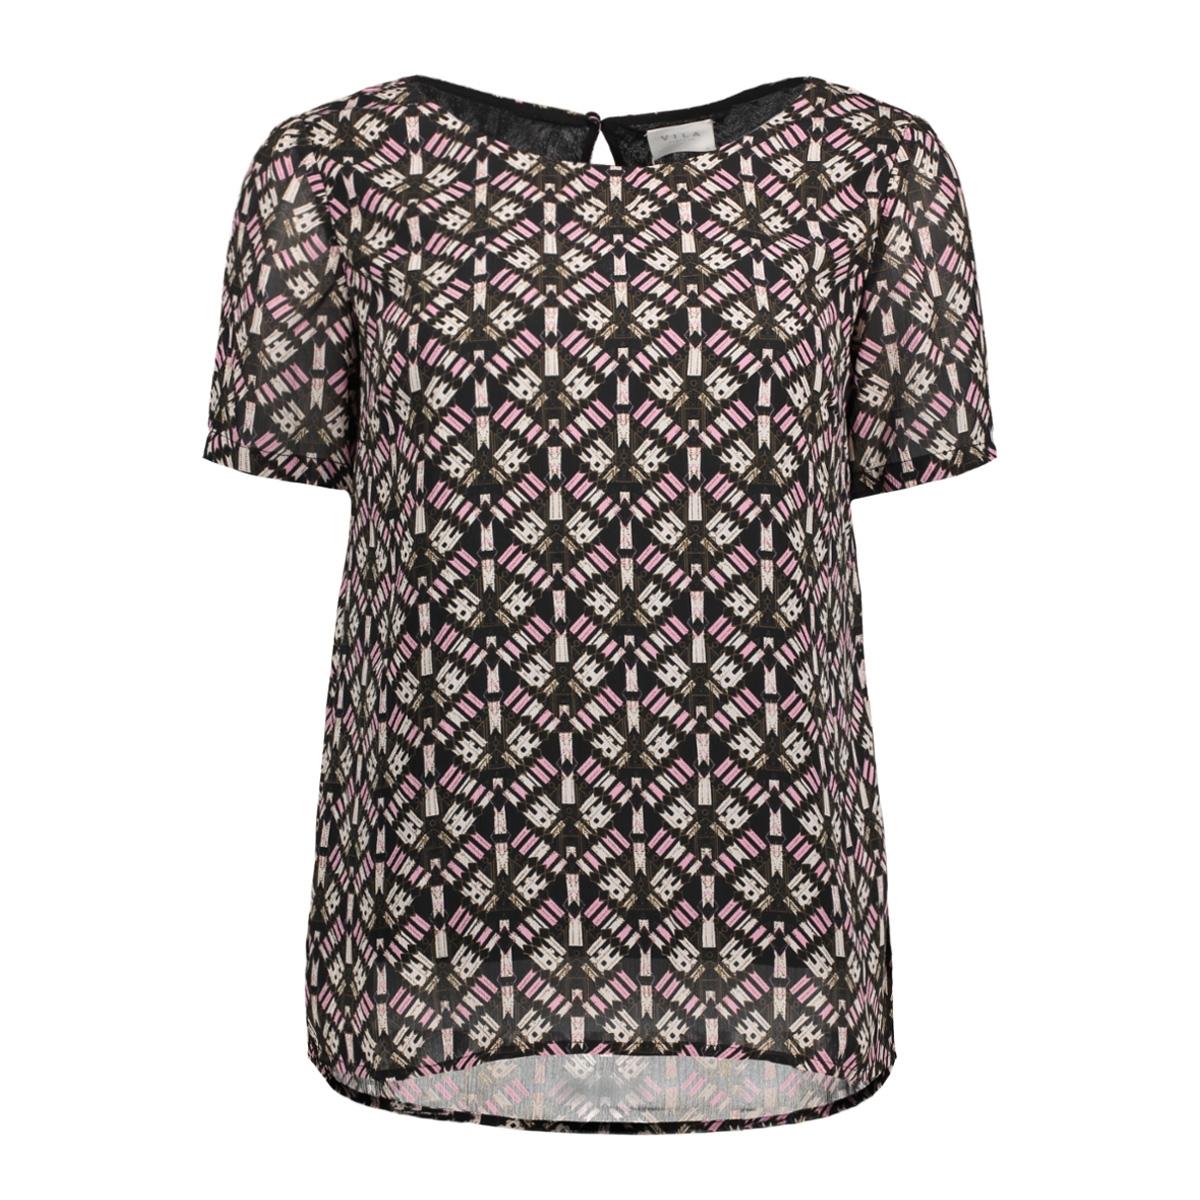 vimonar s/s top 14043771 vila blouse black